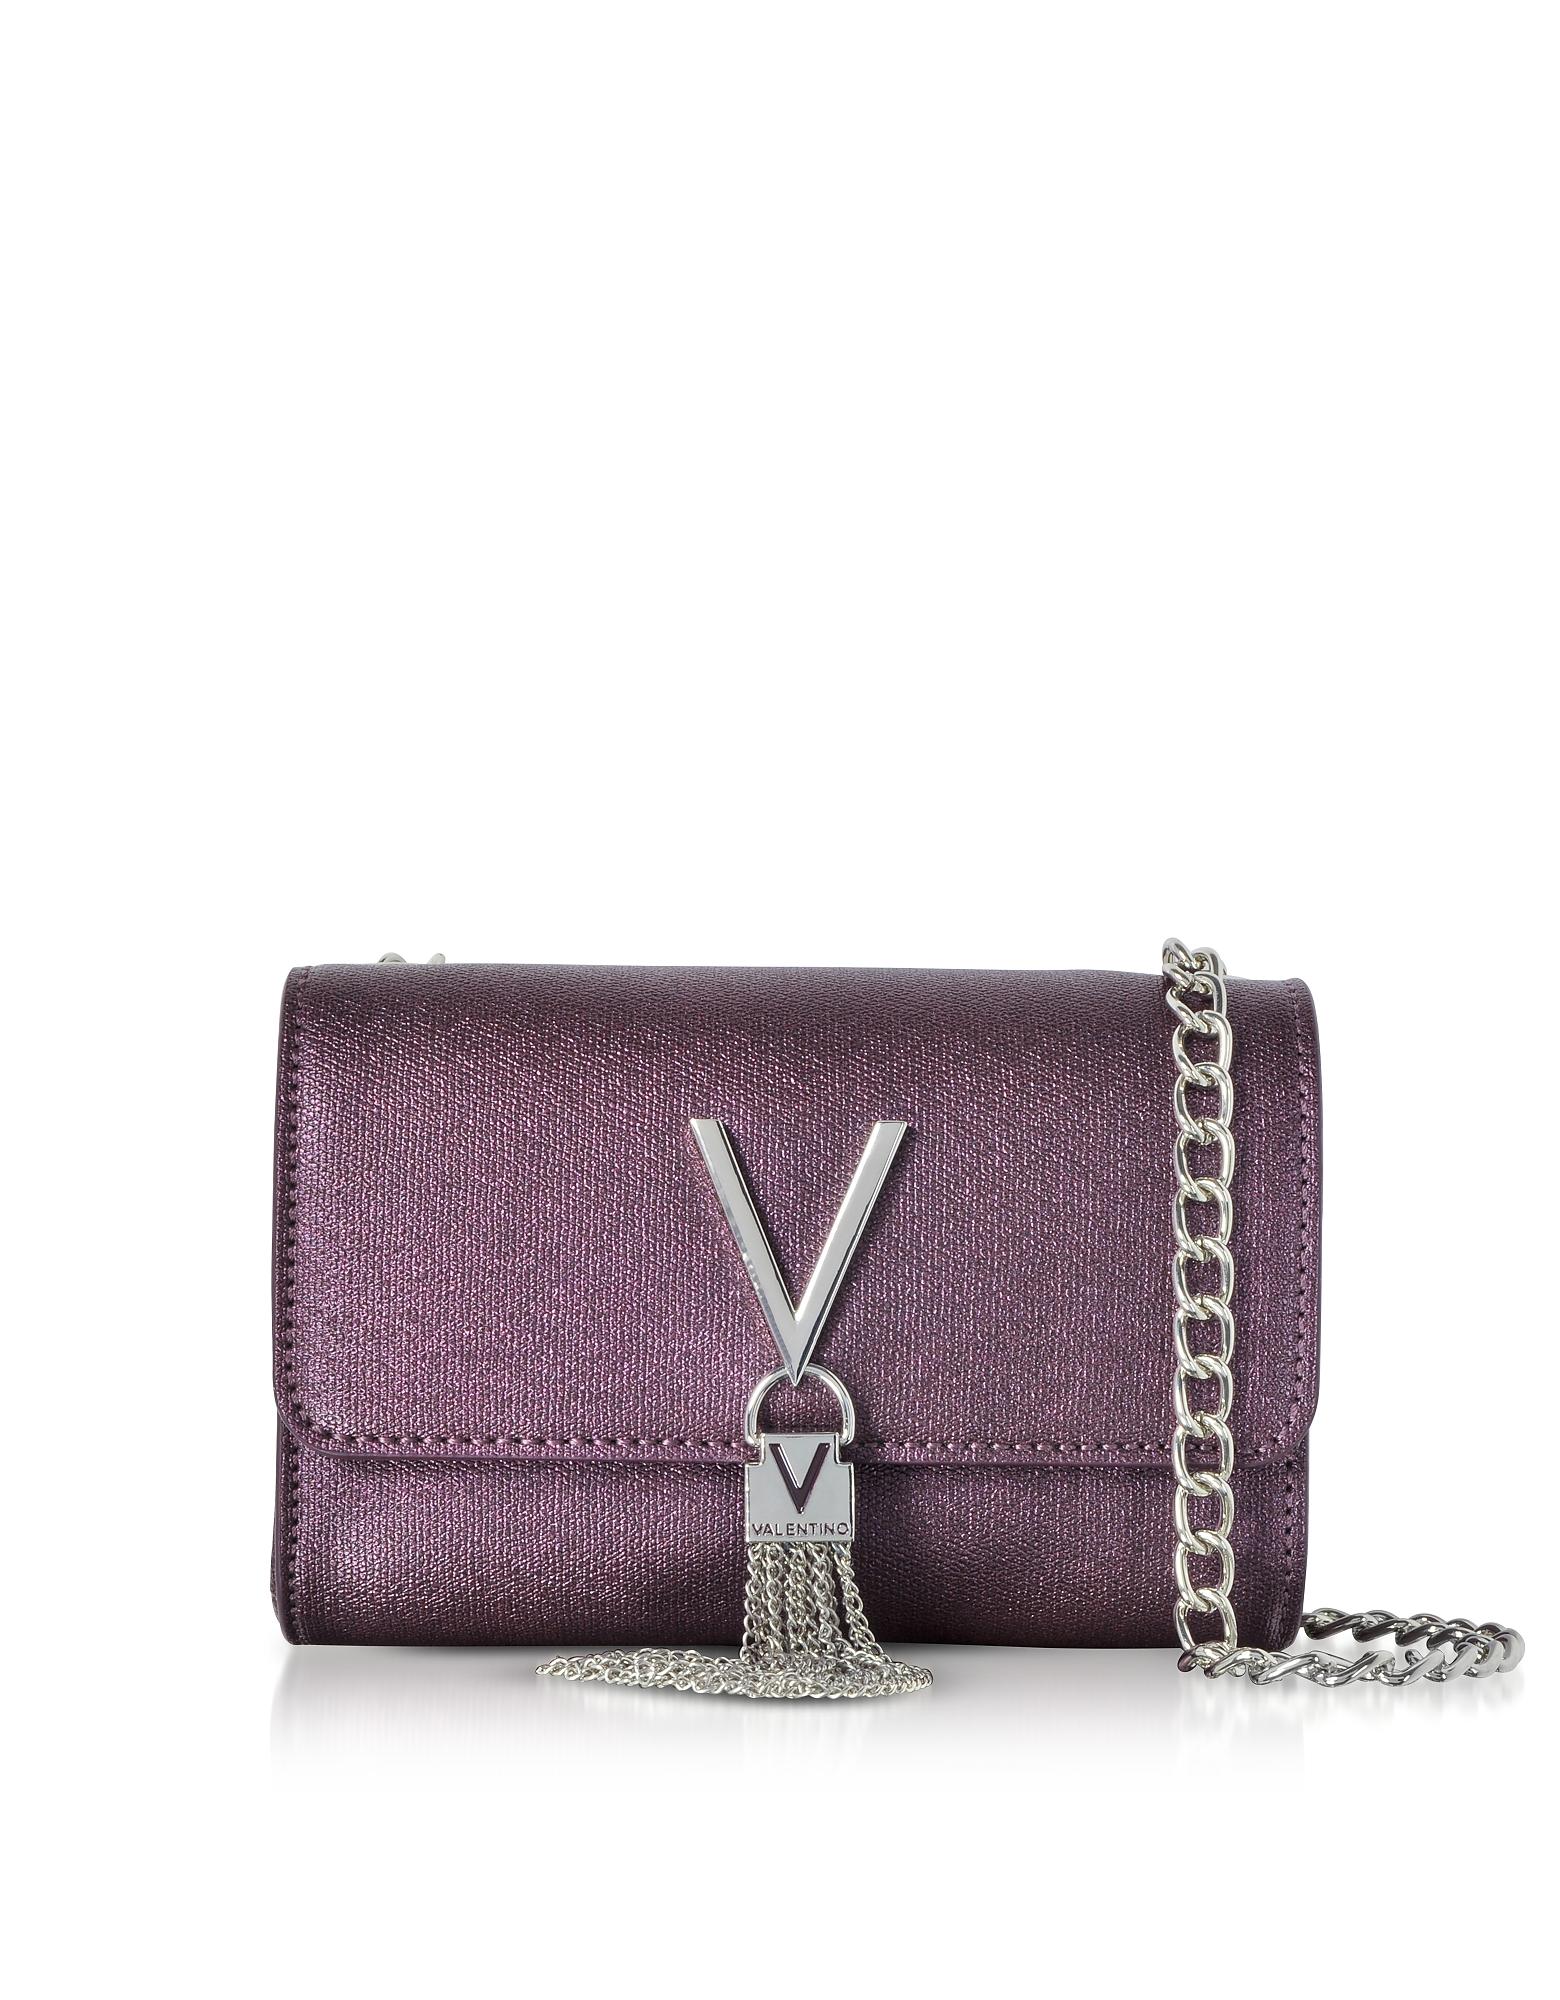 Valentino by Mario Valentino Handbags, Eco Grained Leather Marilyn Mini Shoulder Bag